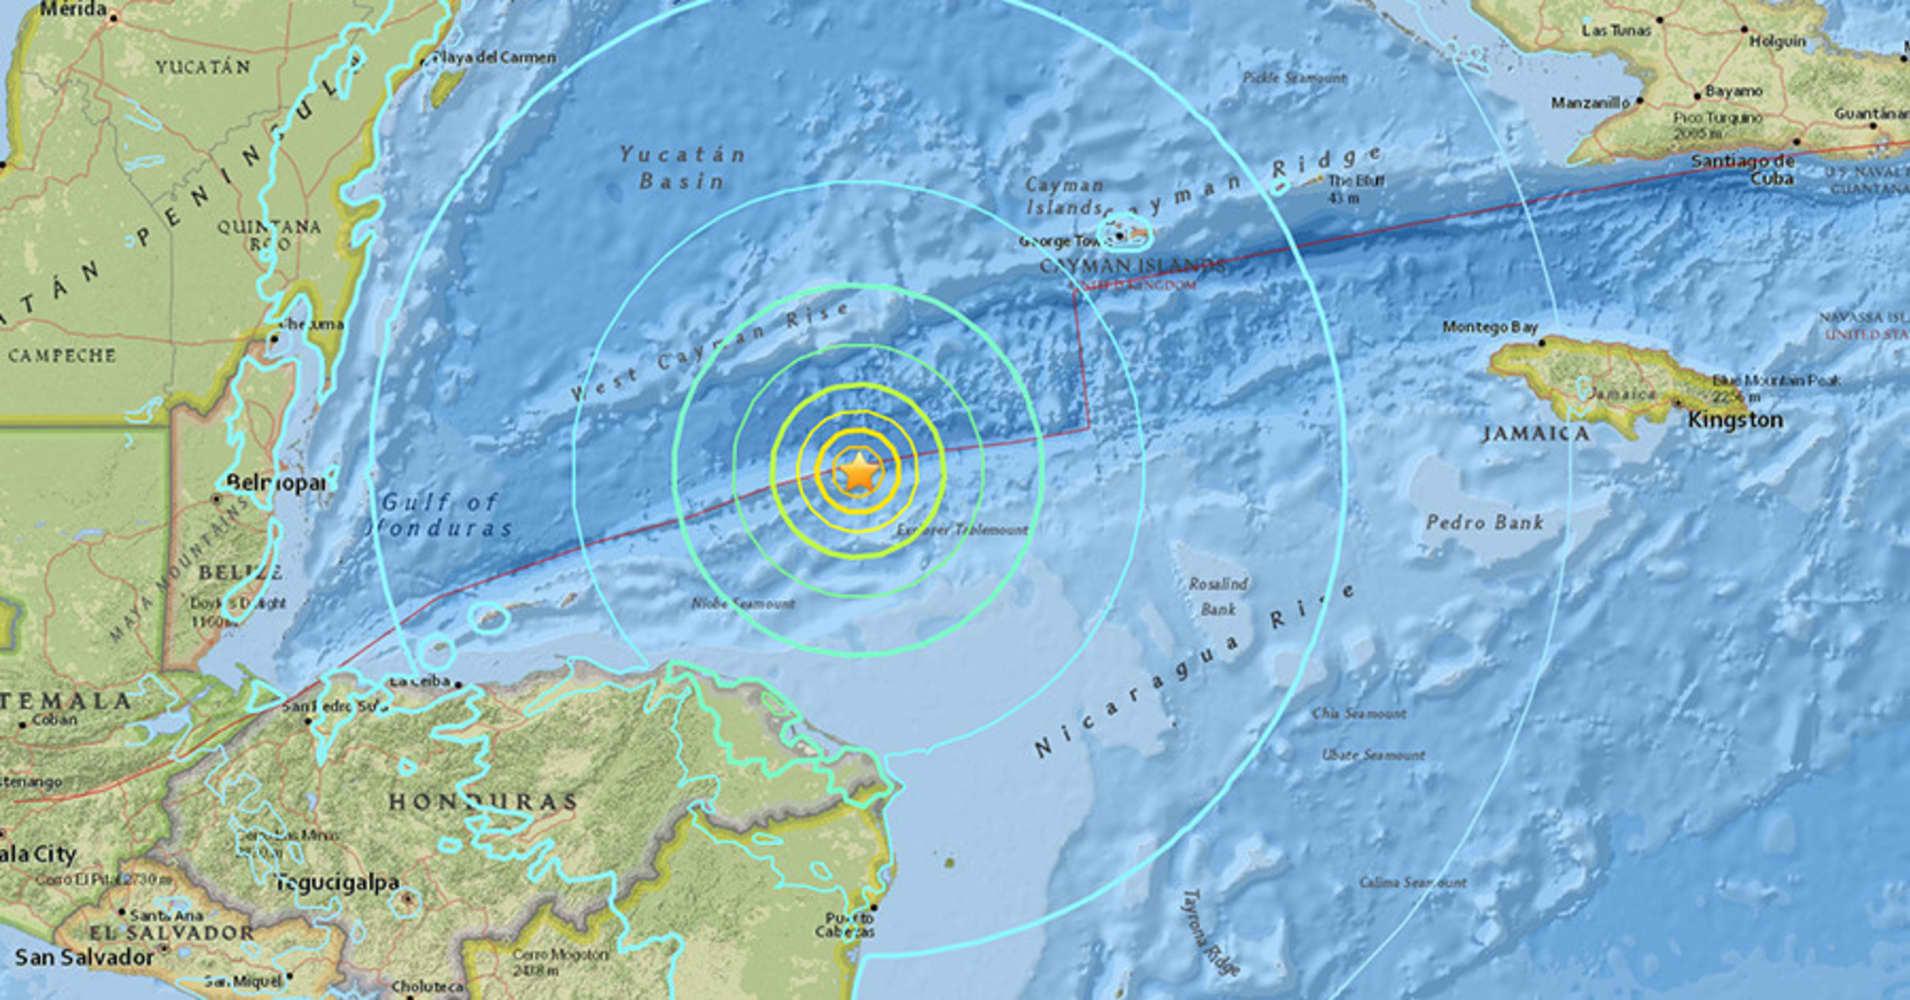 Magnitude 7.8 earthquake strikes Caribbean, tsunami waves possible: USGS